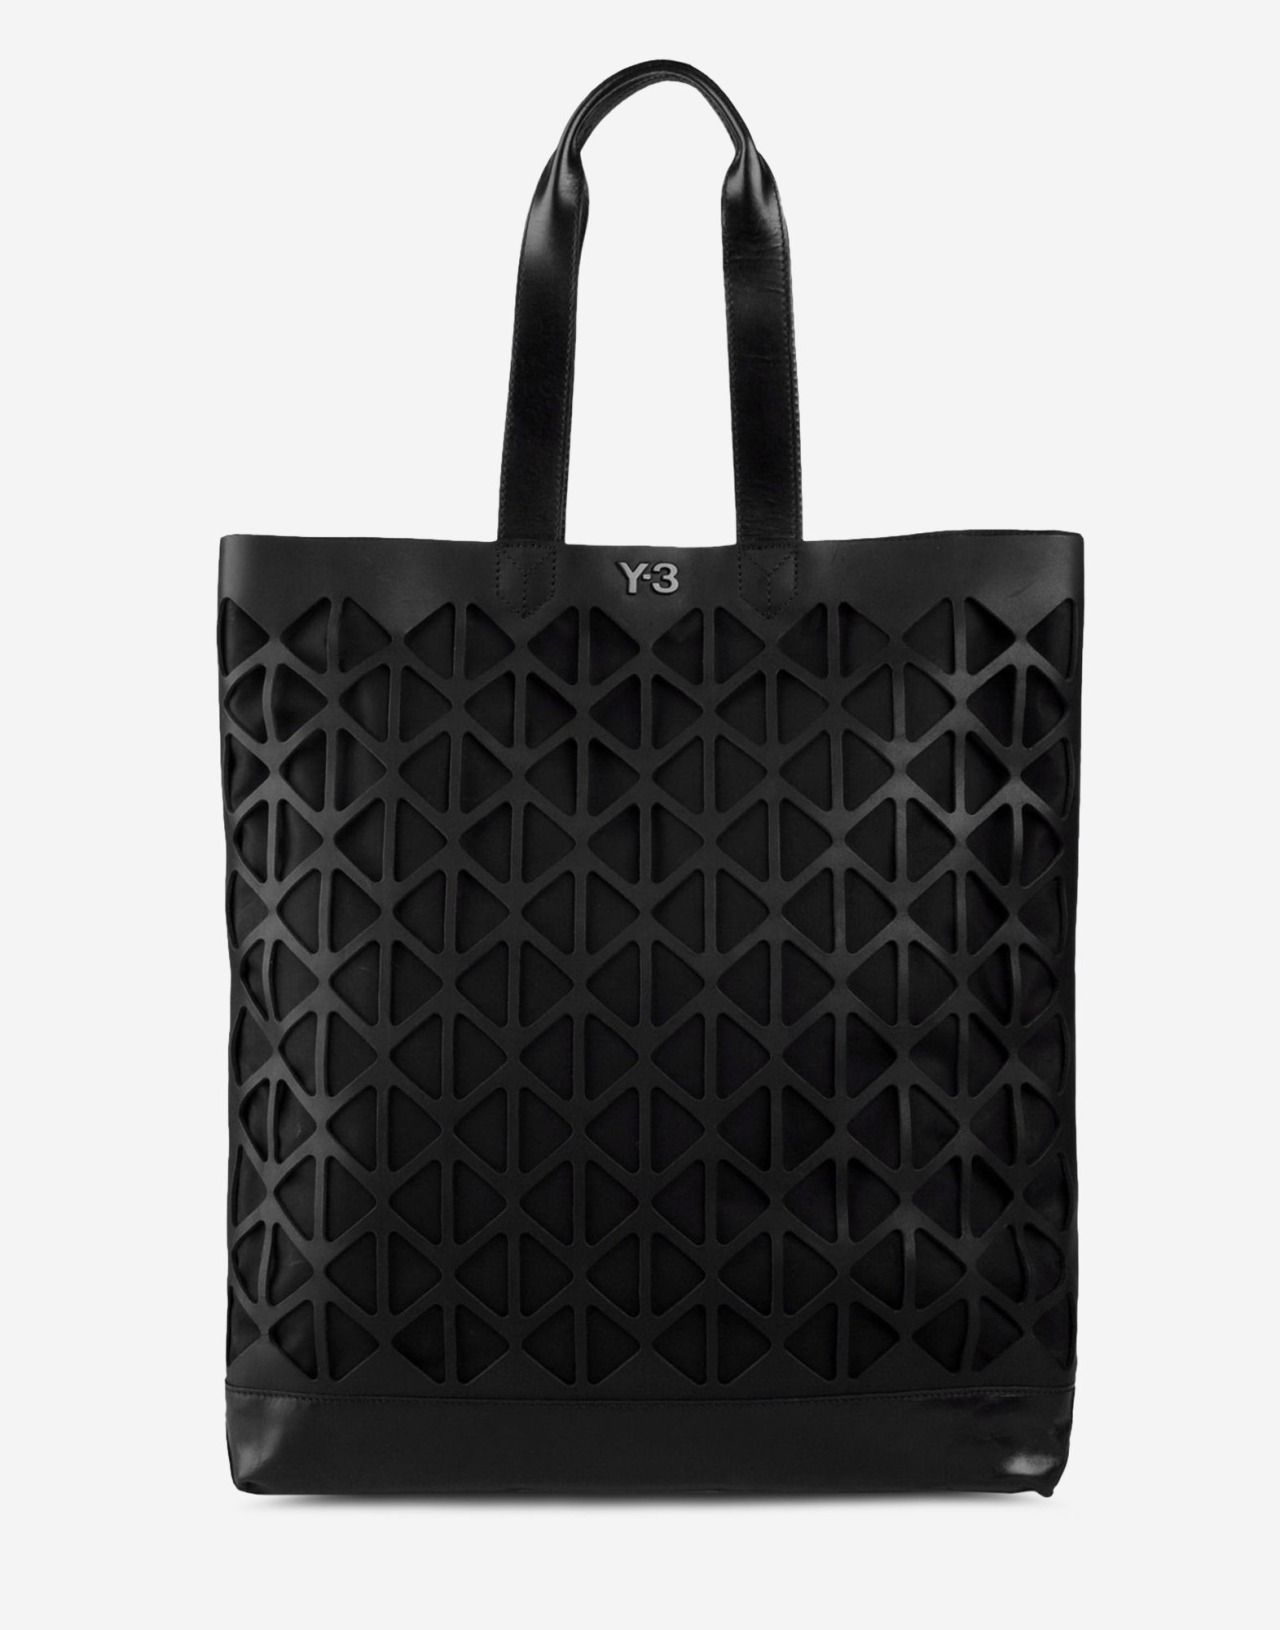 Source gashetka  Patterns  Pinterest  Tote handbags